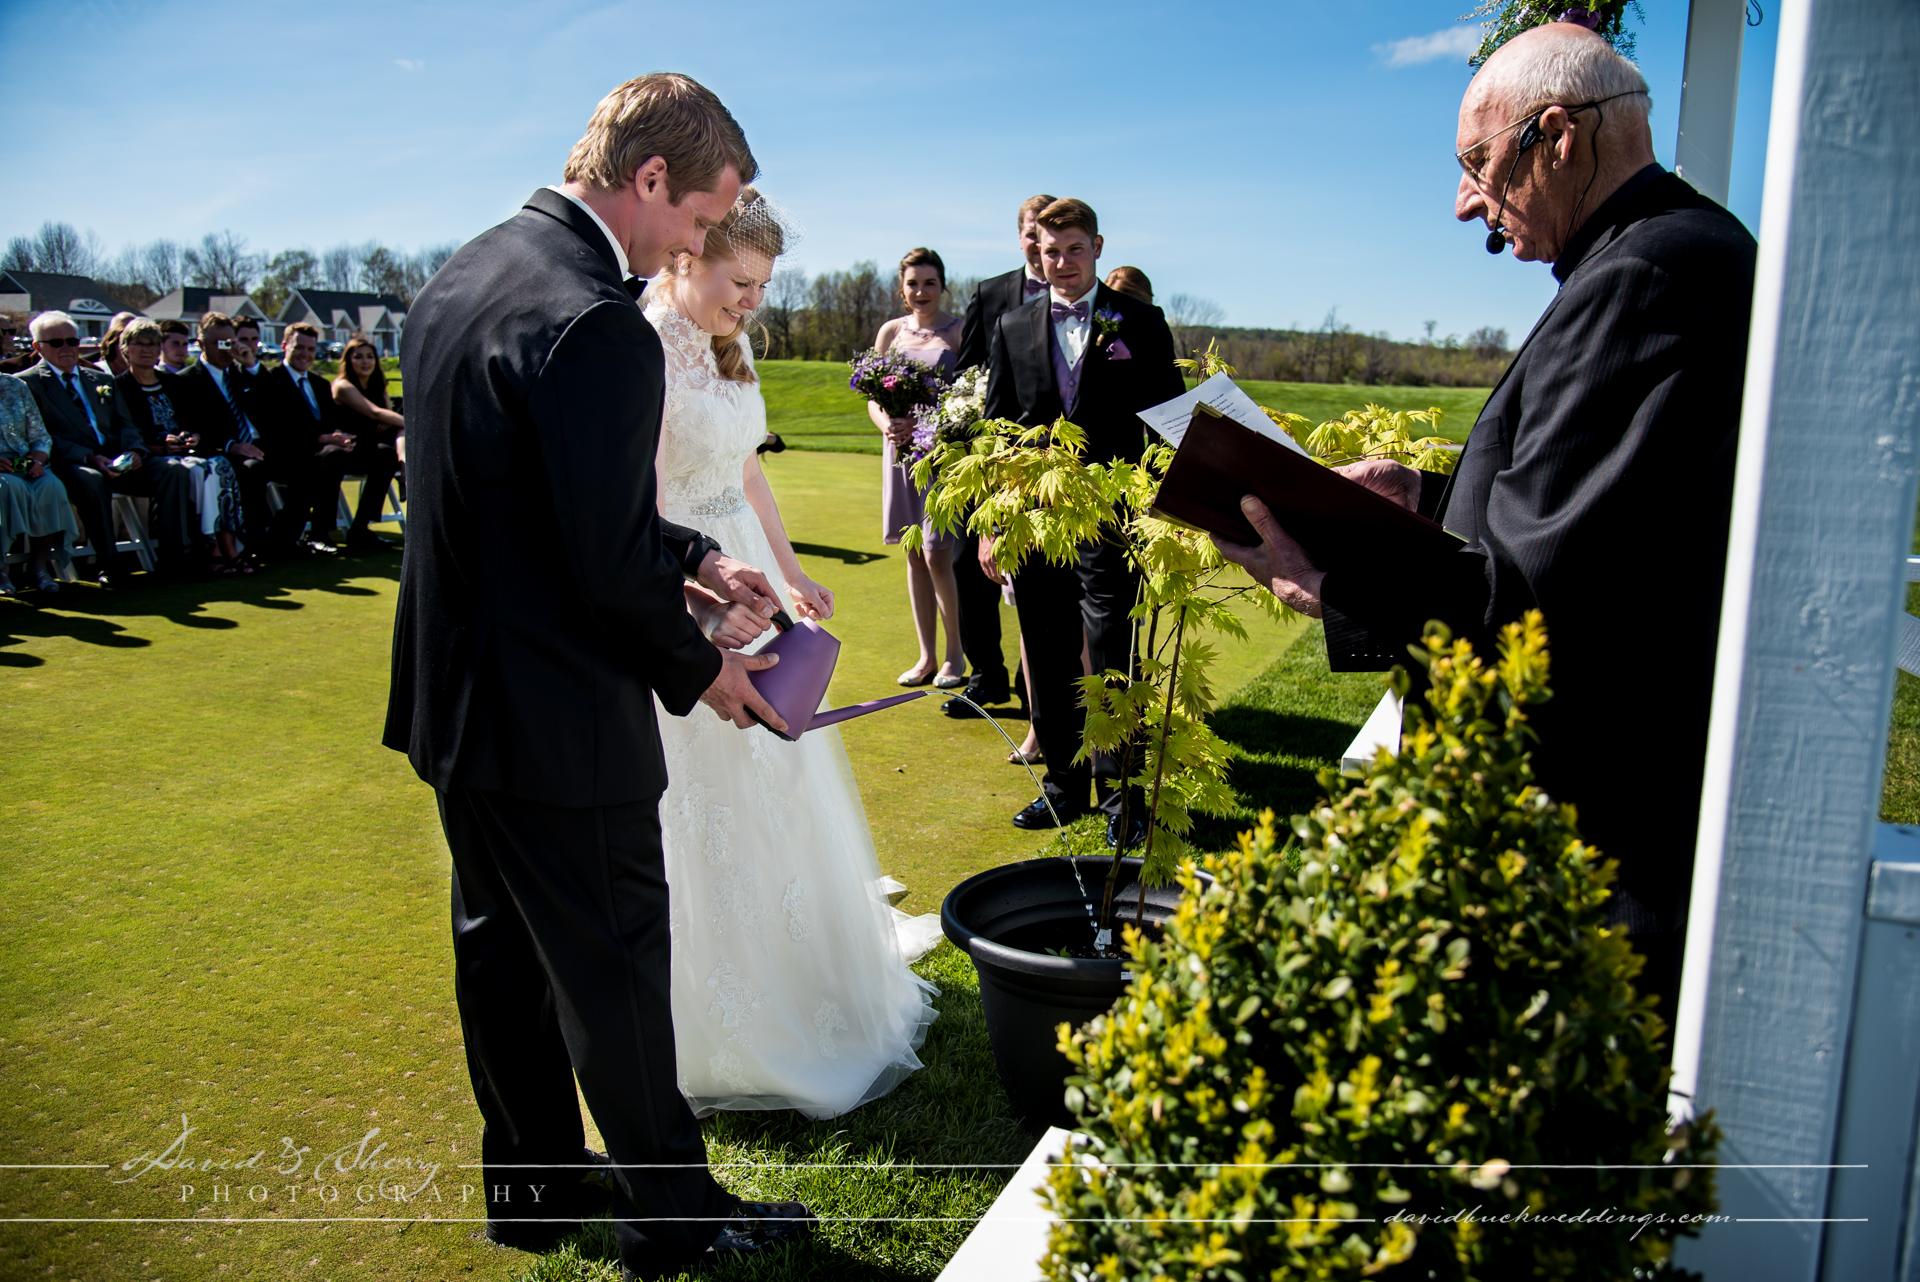 Cobble_Beach_Wedding_Photography_14